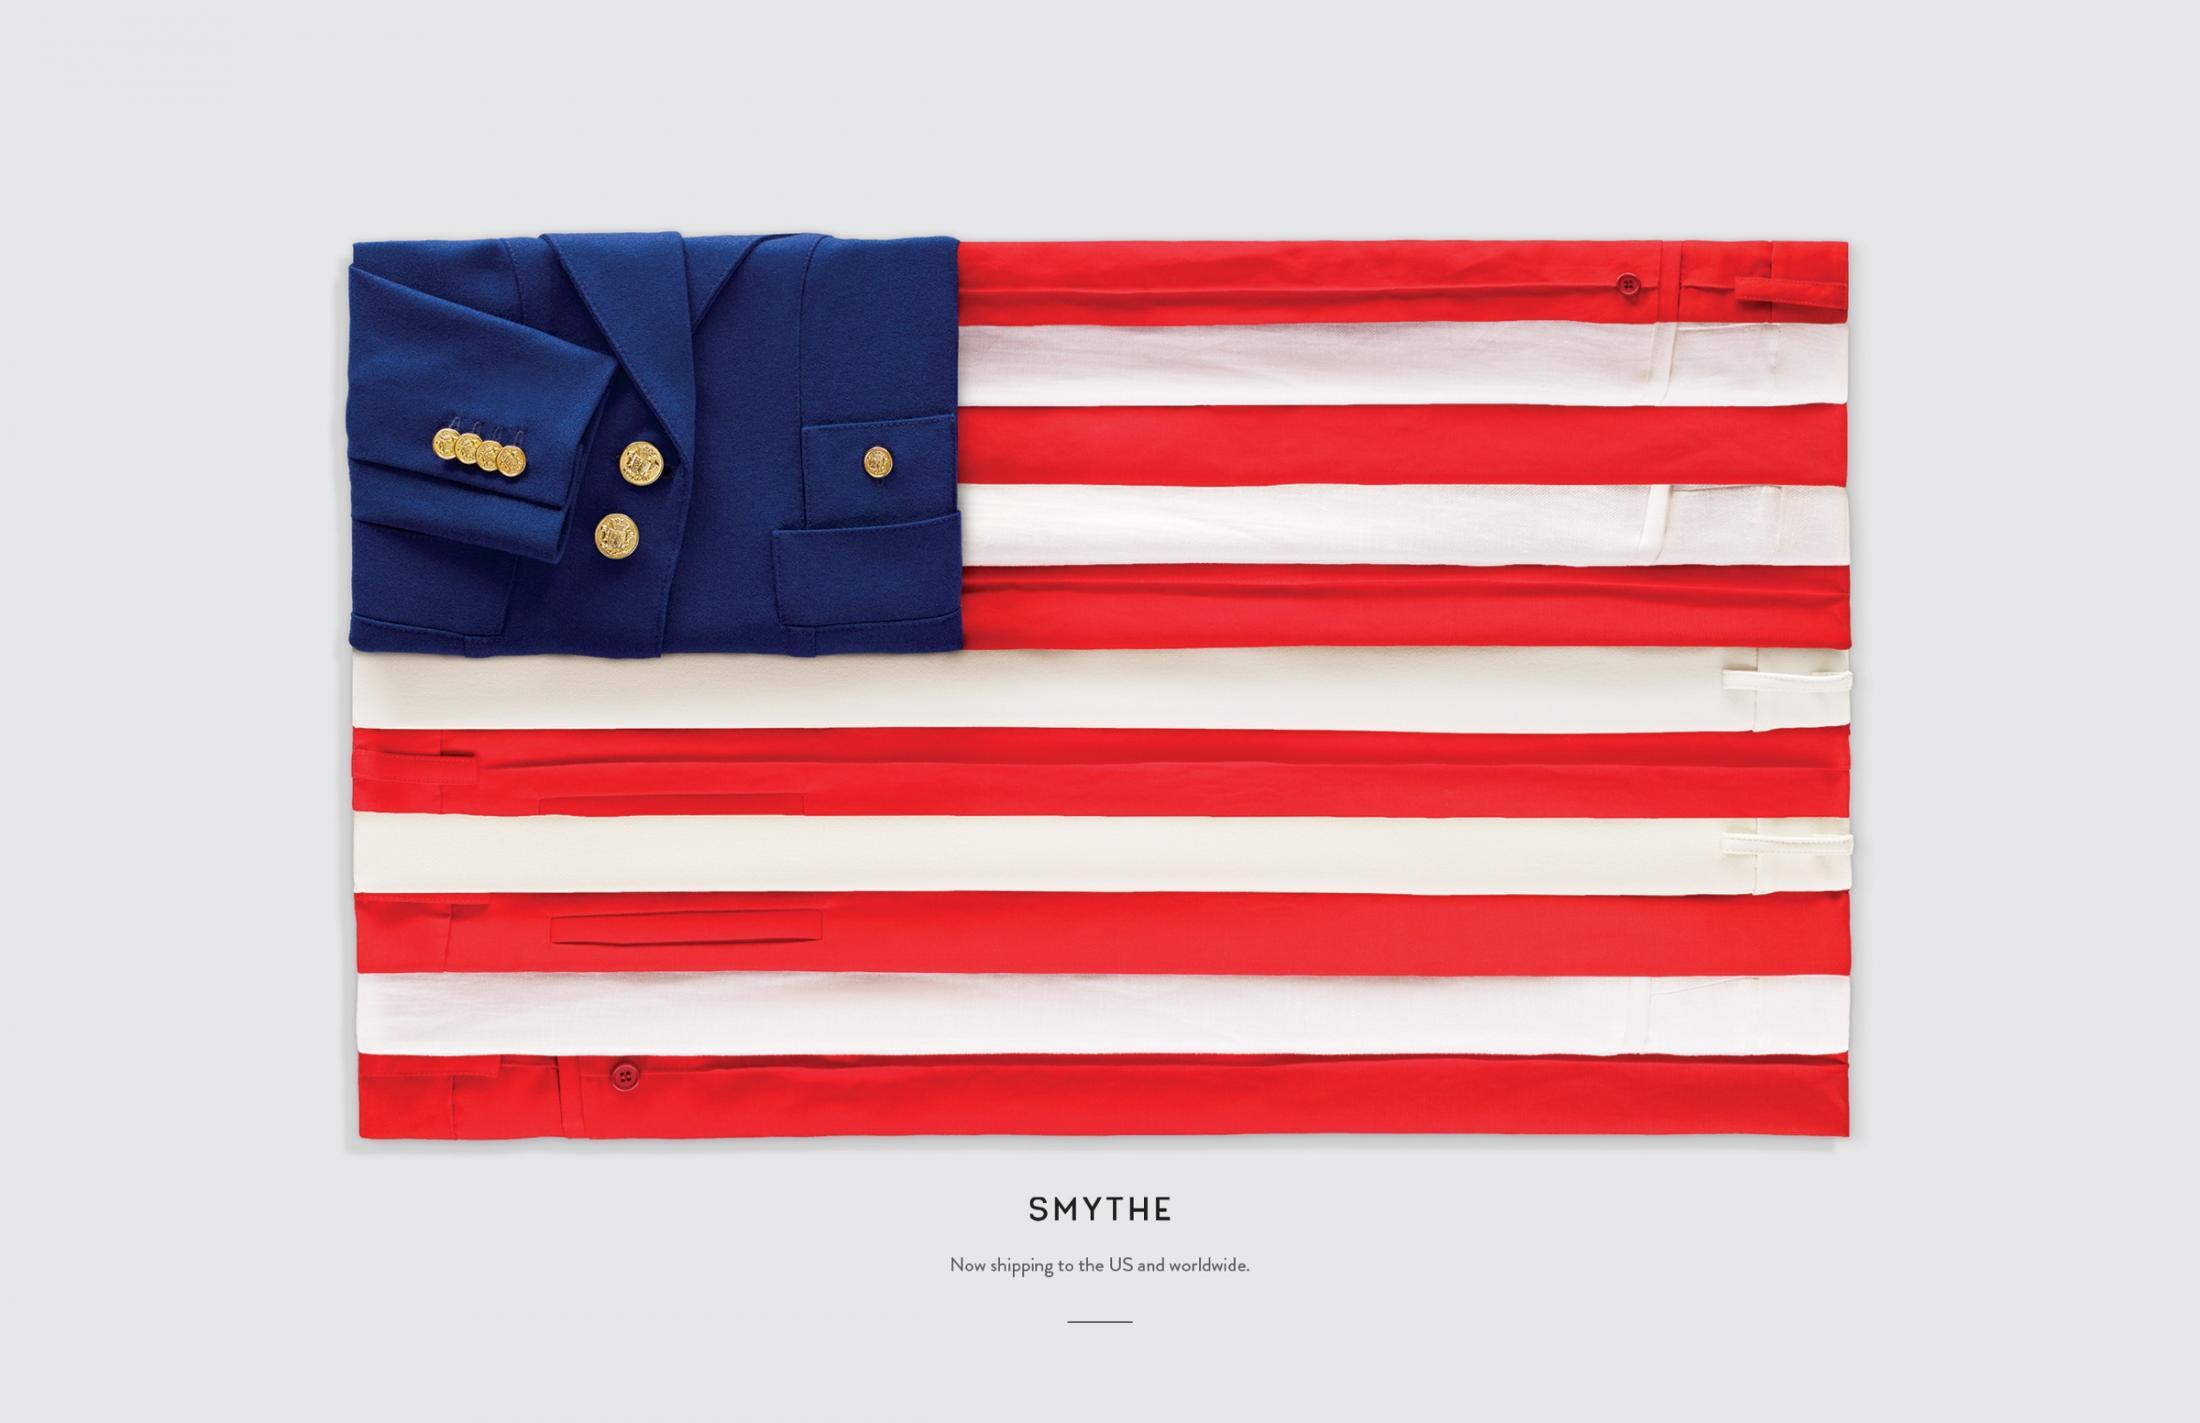 Smythe Print Ad - Flags, US